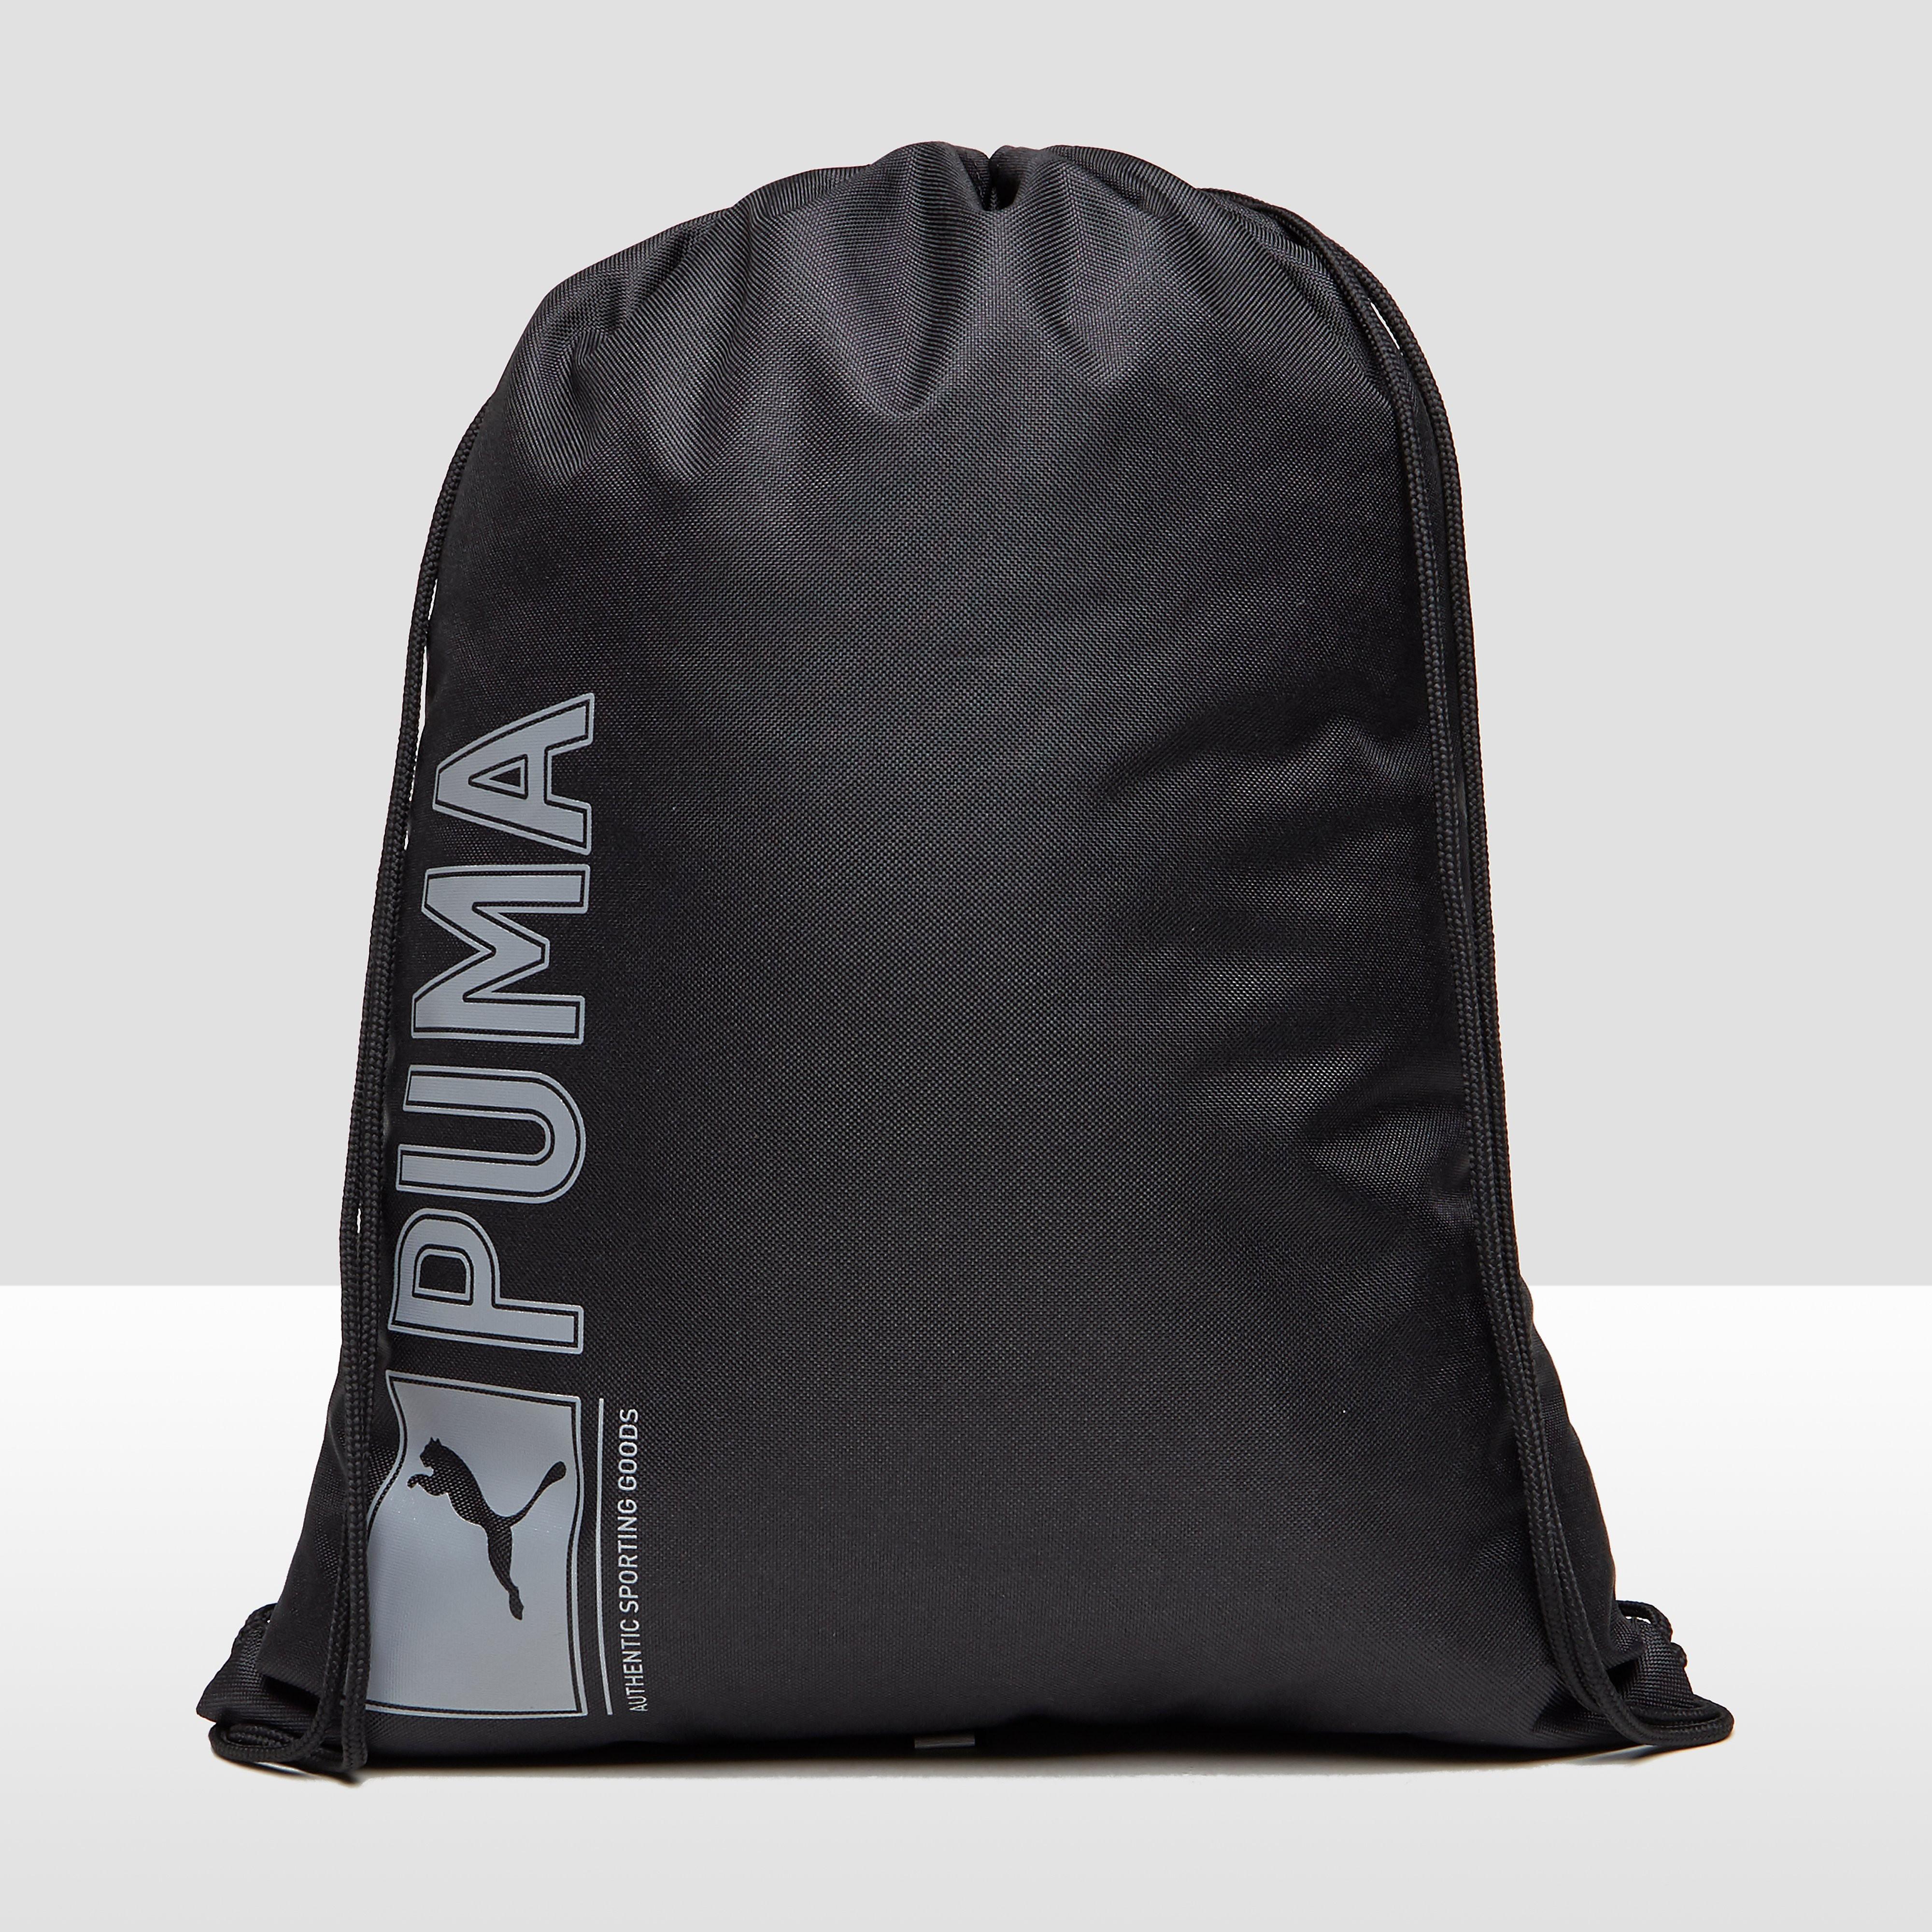 PUMA PIONEER GYMTAS